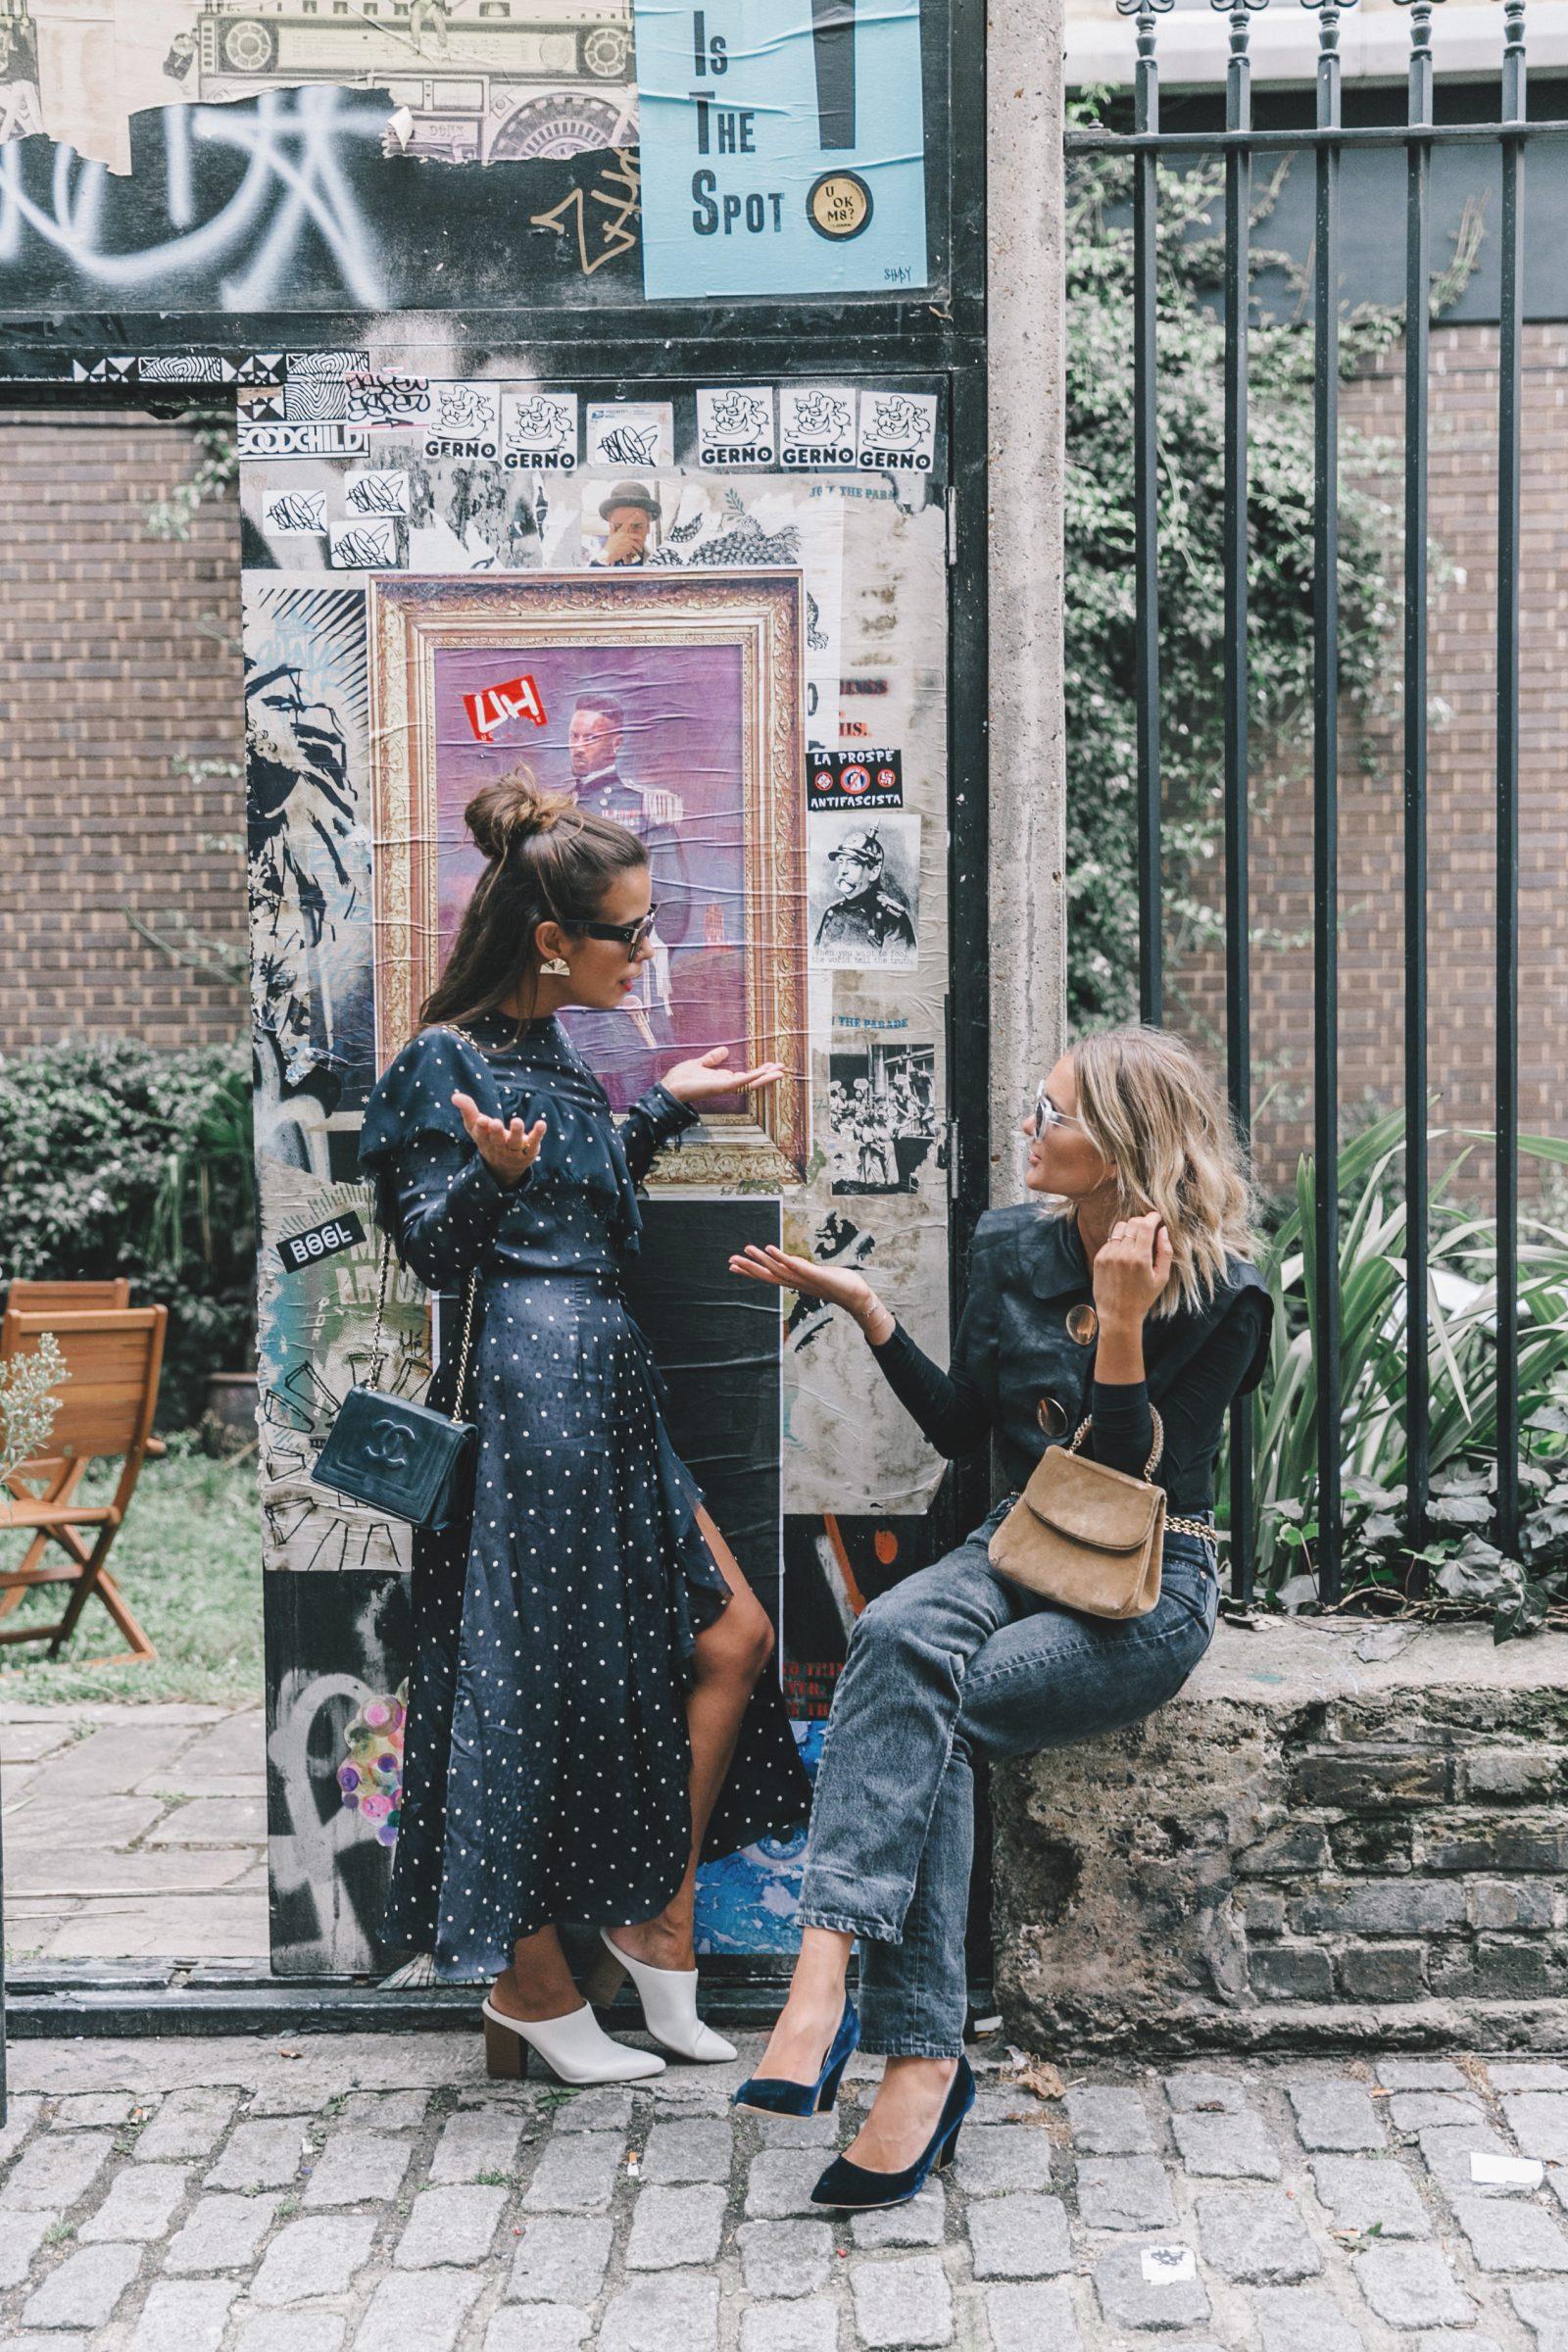 lfw-london_fashion_week_ss17-street_style-outfits-collage_vintage-vintage-topshop_unique-polka_dot_dress-white_mules-topshop_boutique-adenorah-48